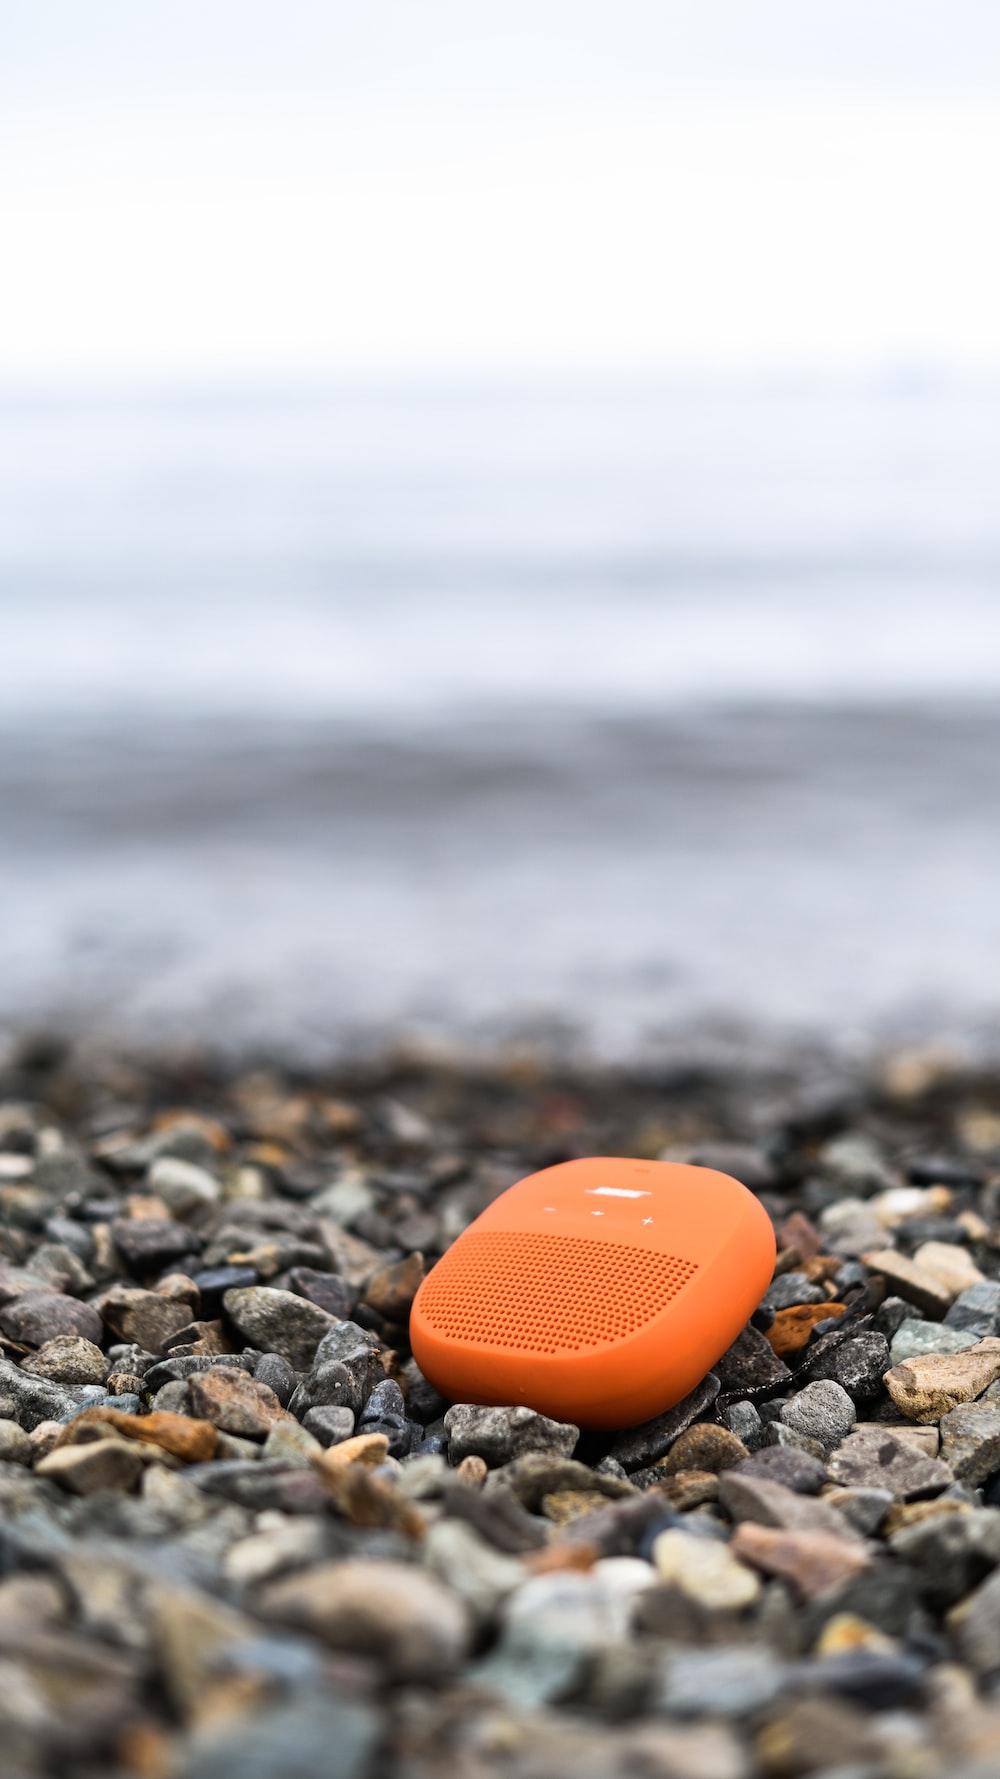 orange heart on rocky shore during daytime